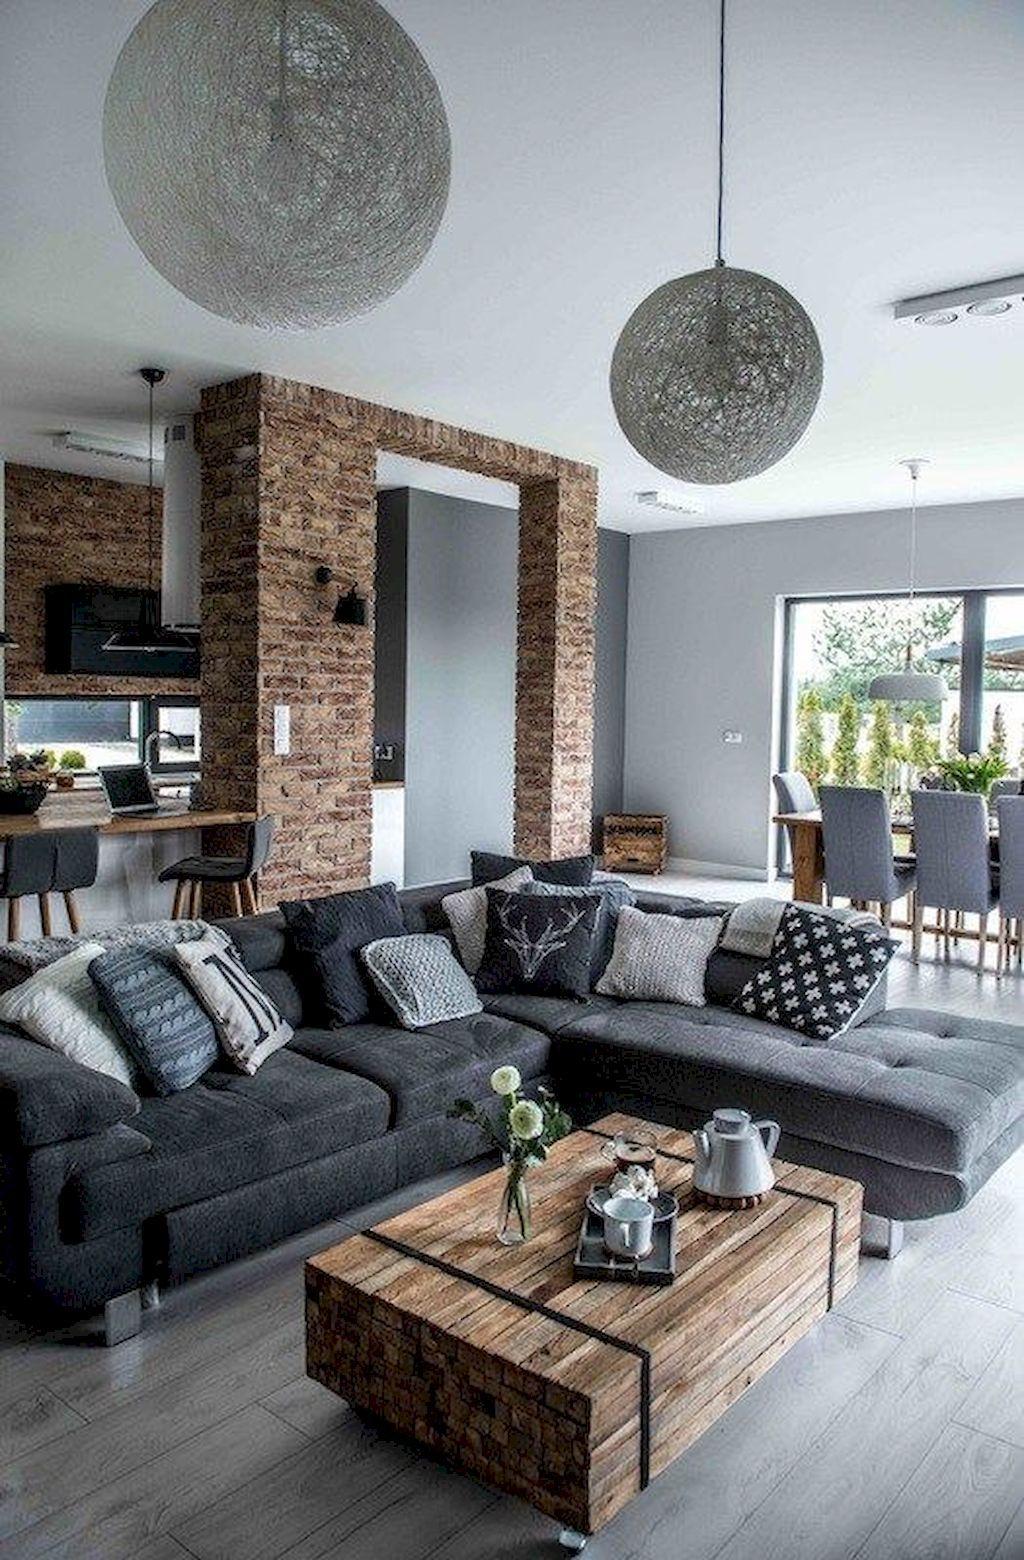 25 Modern Farmhouse Living Room First Apartment Ideas  Farmhouse Endearing Modern Design Of Living Room Inspiration